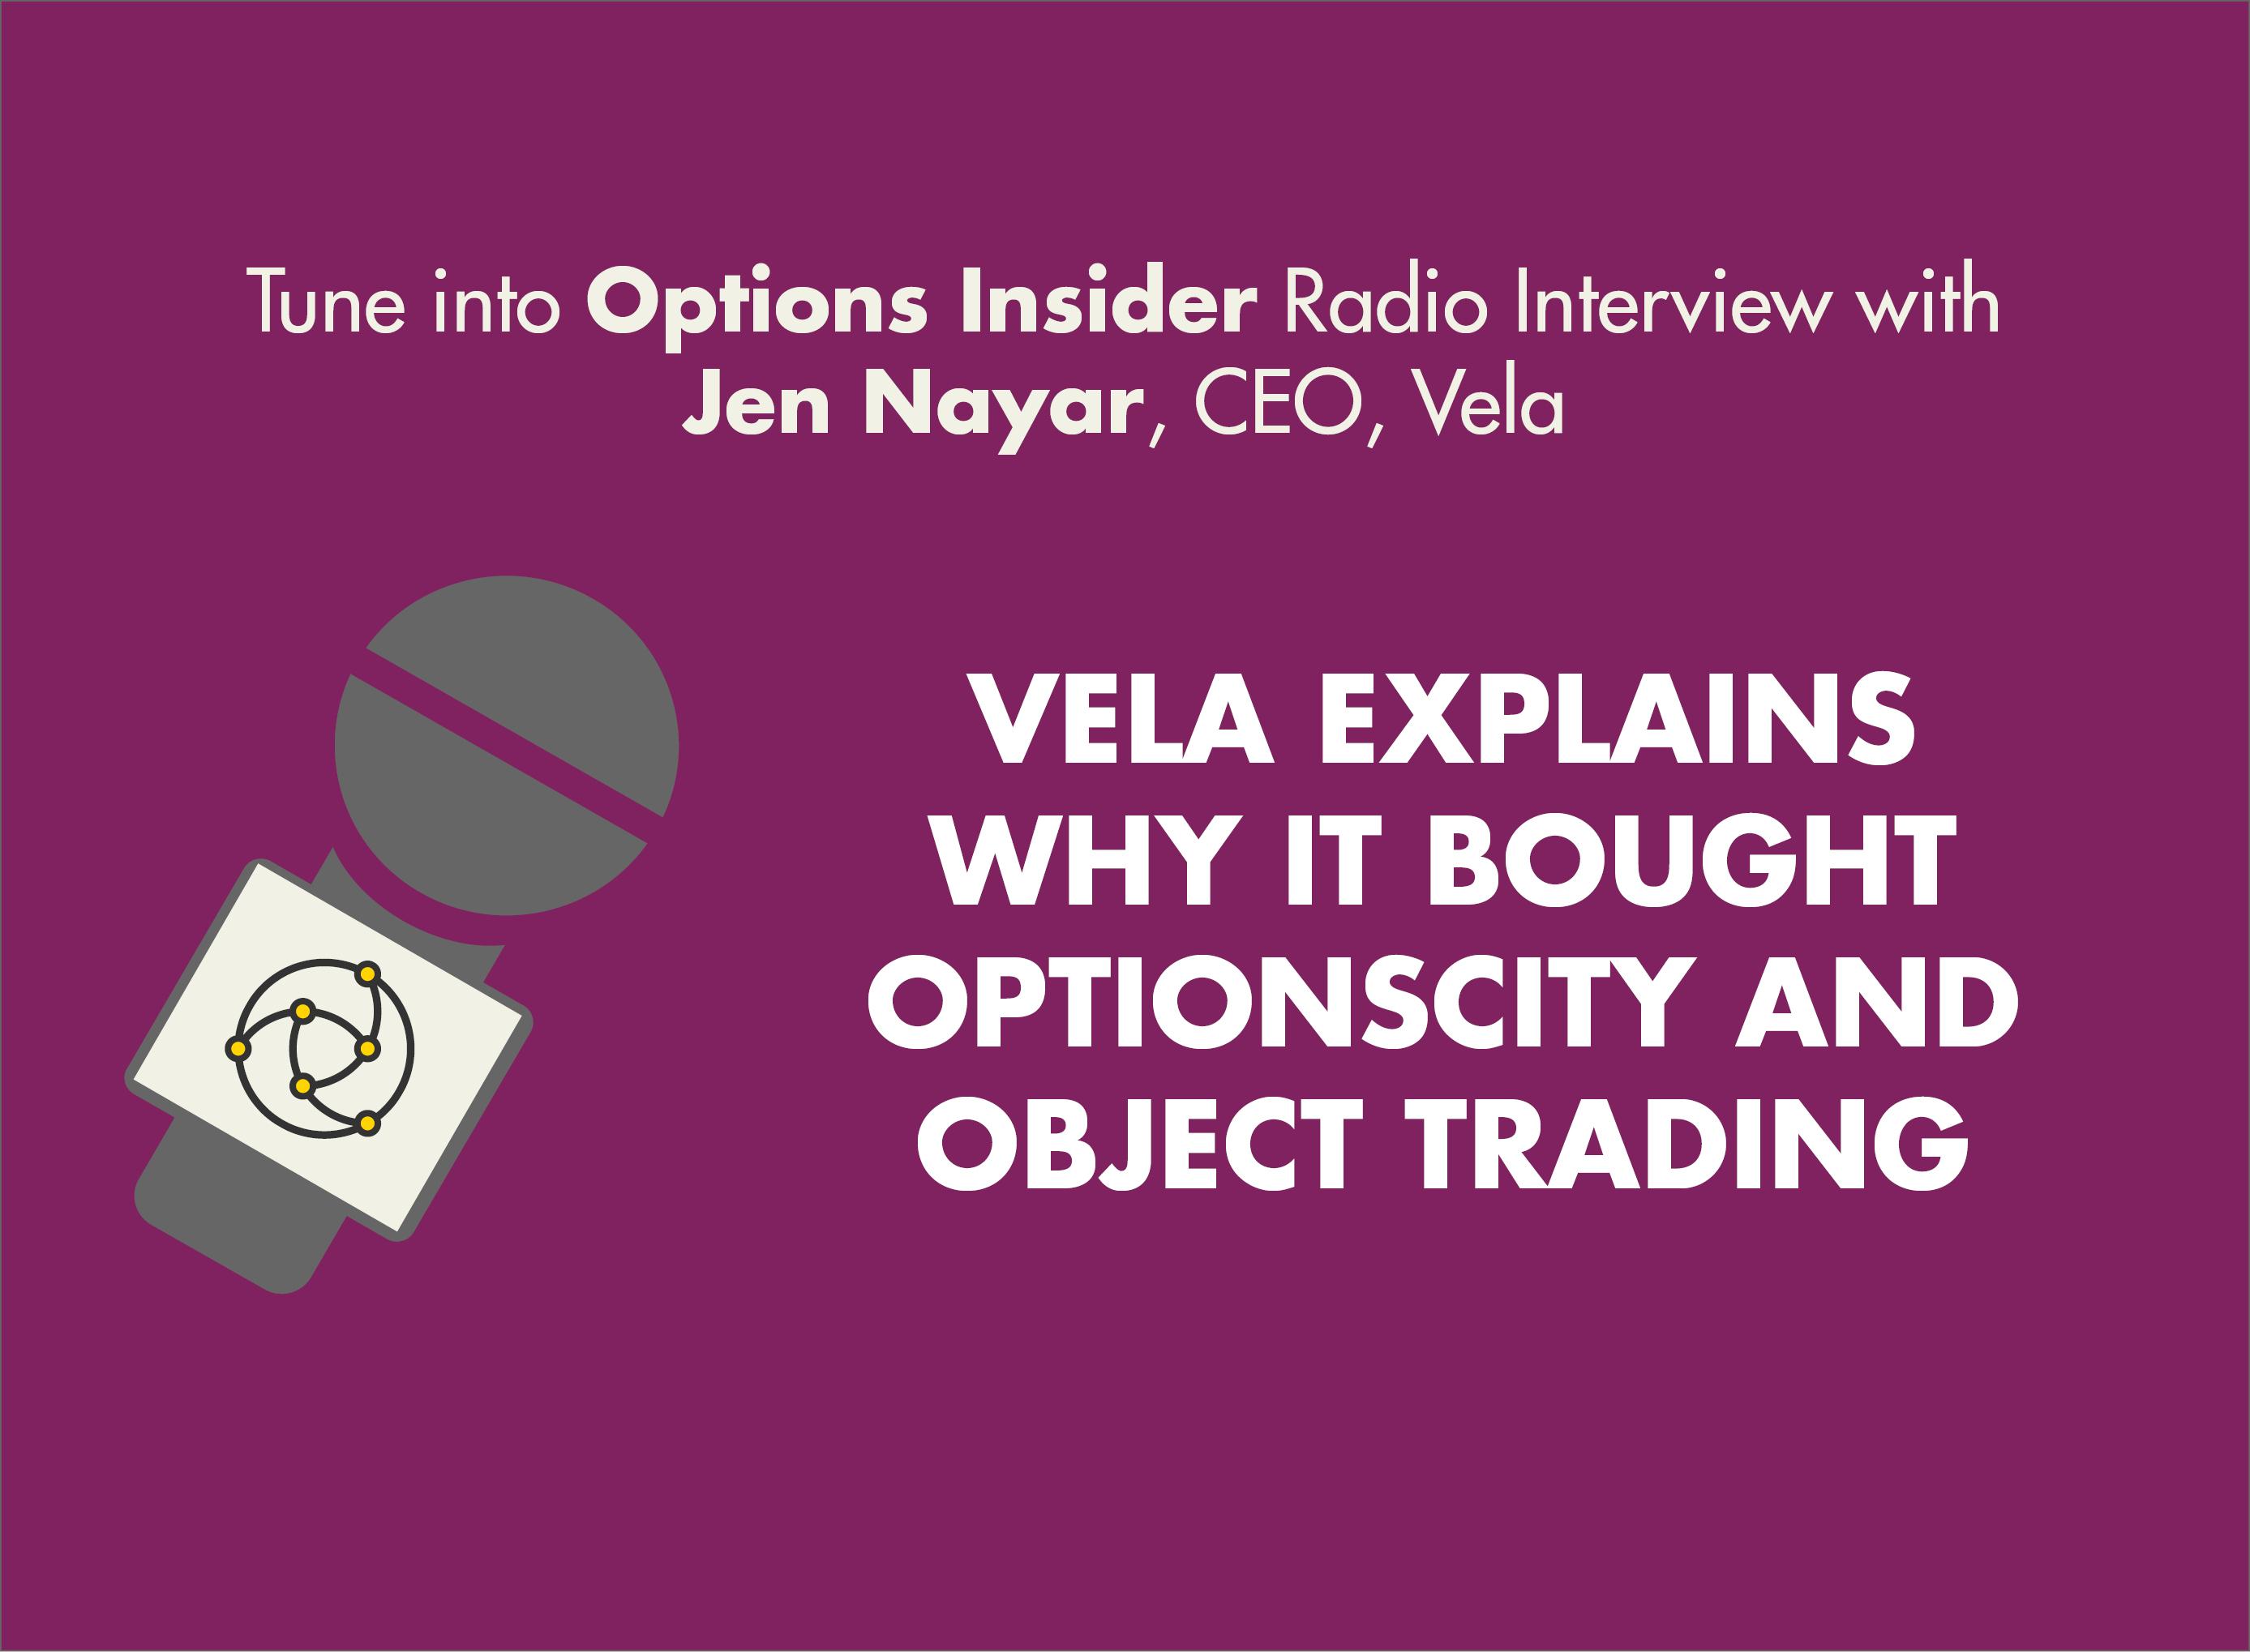 Options Insider Radio Interview with Jen Nayar